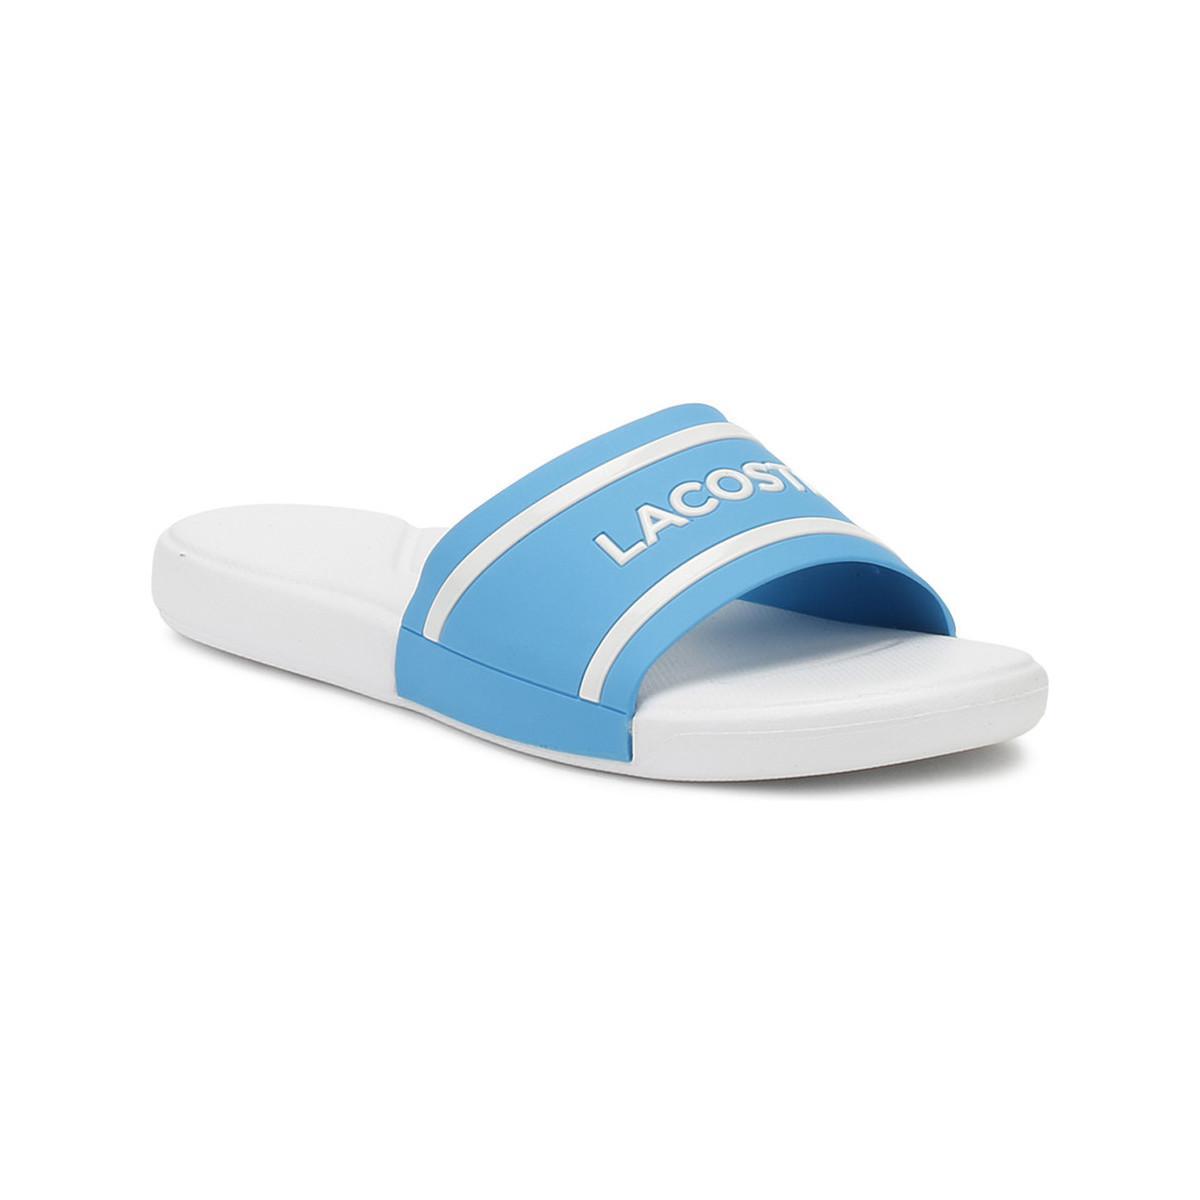 38bbaeb5c76 Lacoste Junior Blue   White L.30 118 2 Slides Girls s In Blue in ...